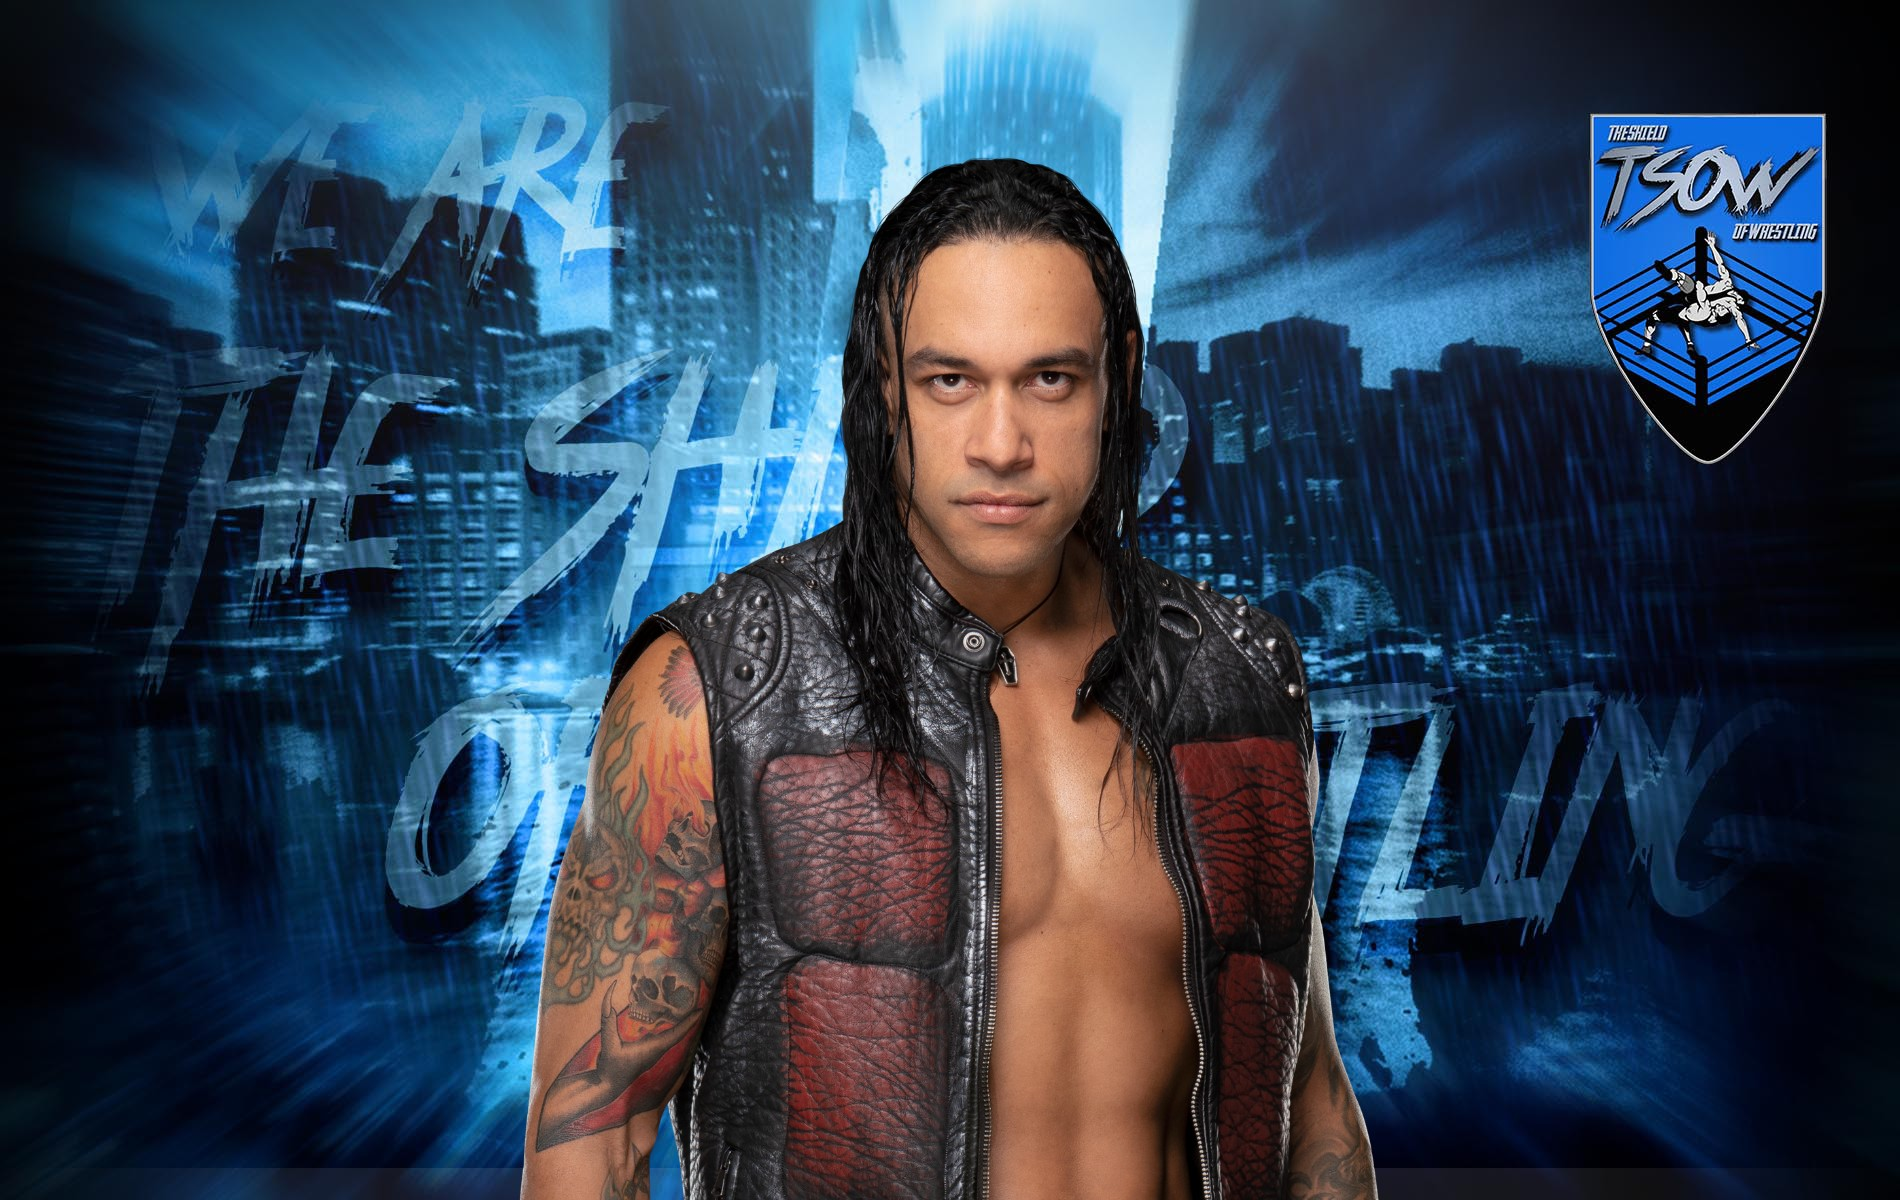 Damian Priest sarà il nuovo John Cena?